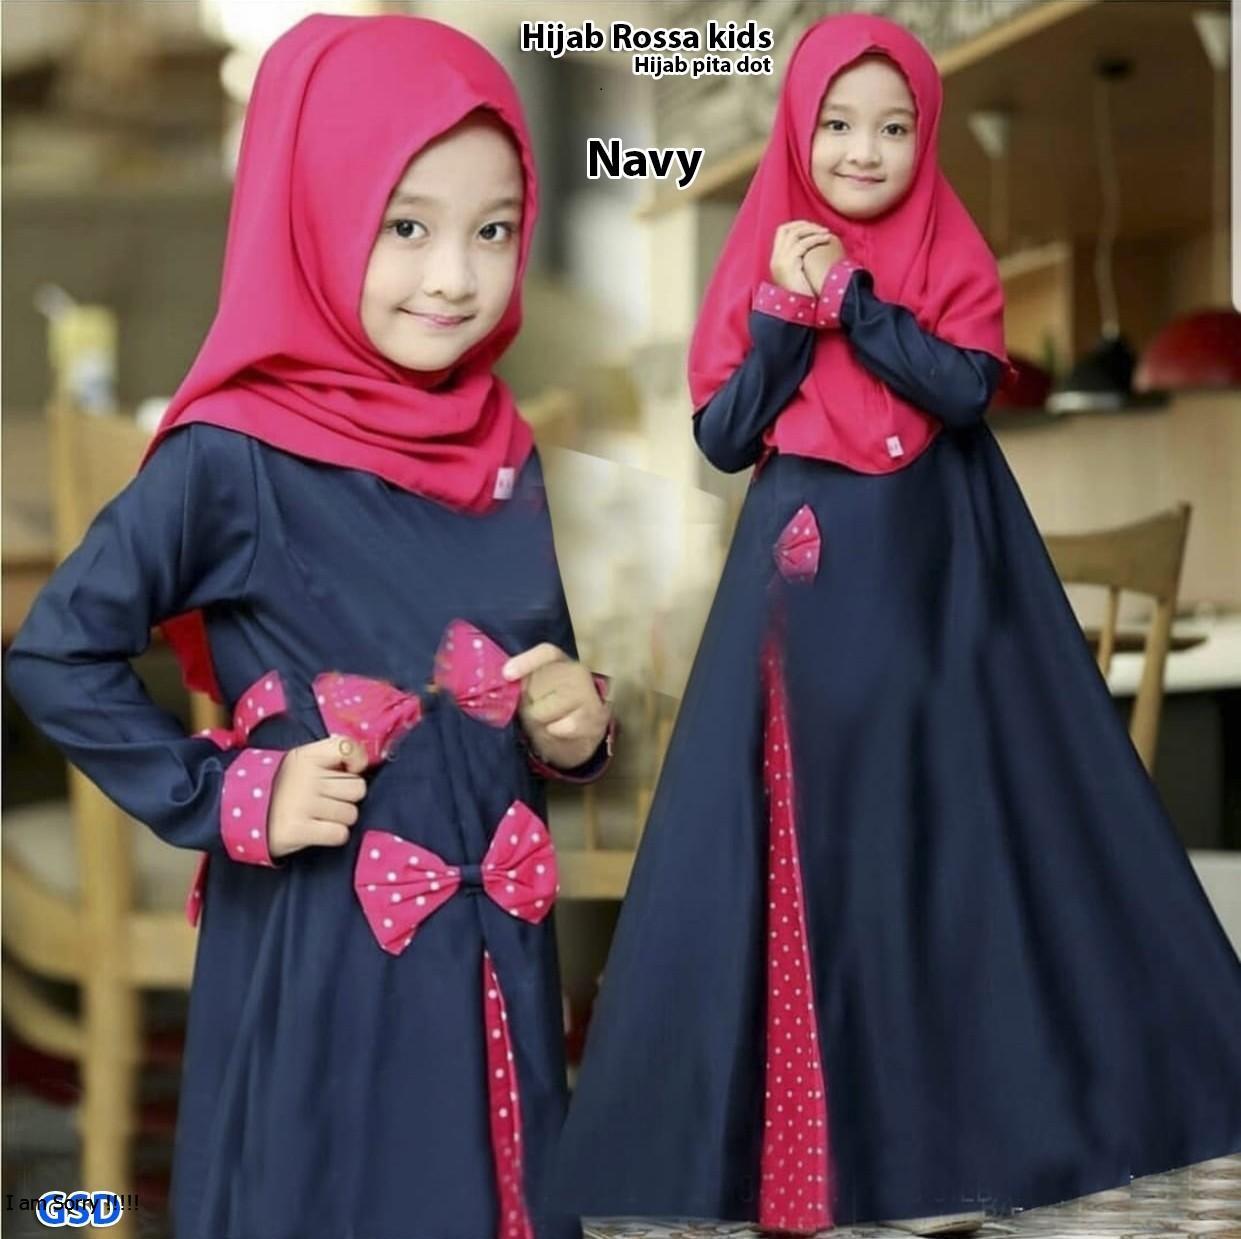 NCR-Baju Anak Cewek  Baju Muslim Anak Cewek  Baju Maxi Anak  Baju 6f362ad6d8